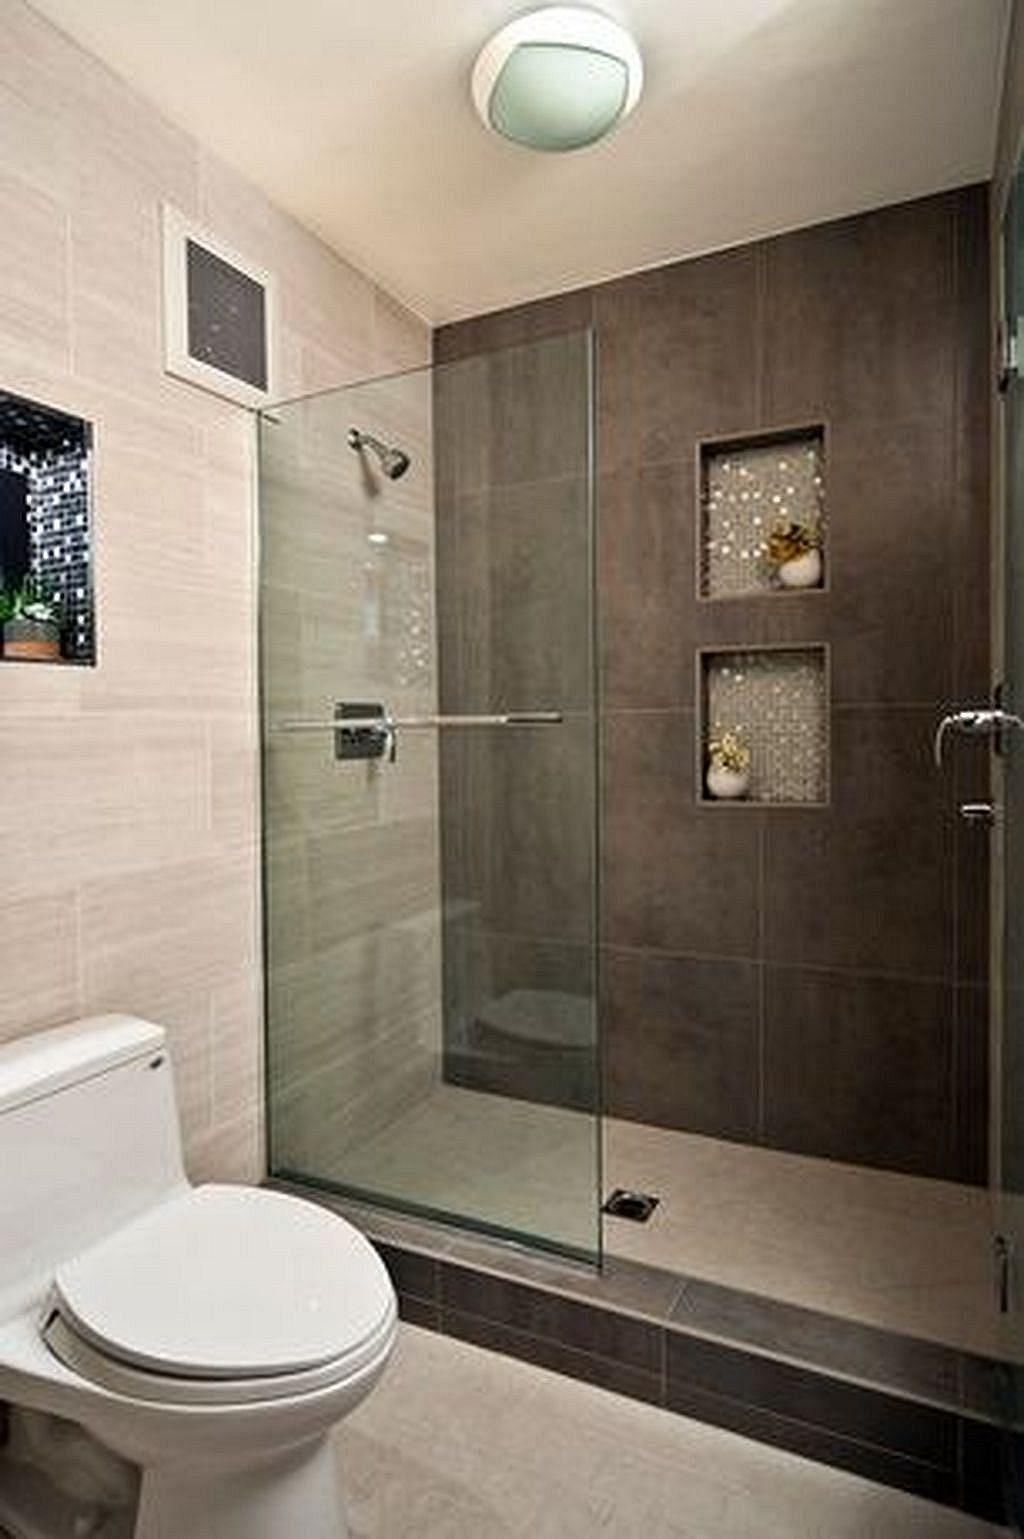 Elegant And Modern Bathroom Shower Tile Master Bath Ideas 26 With Images Bathroom Design Small Modern Bathroom Design Modern Master Bathroom